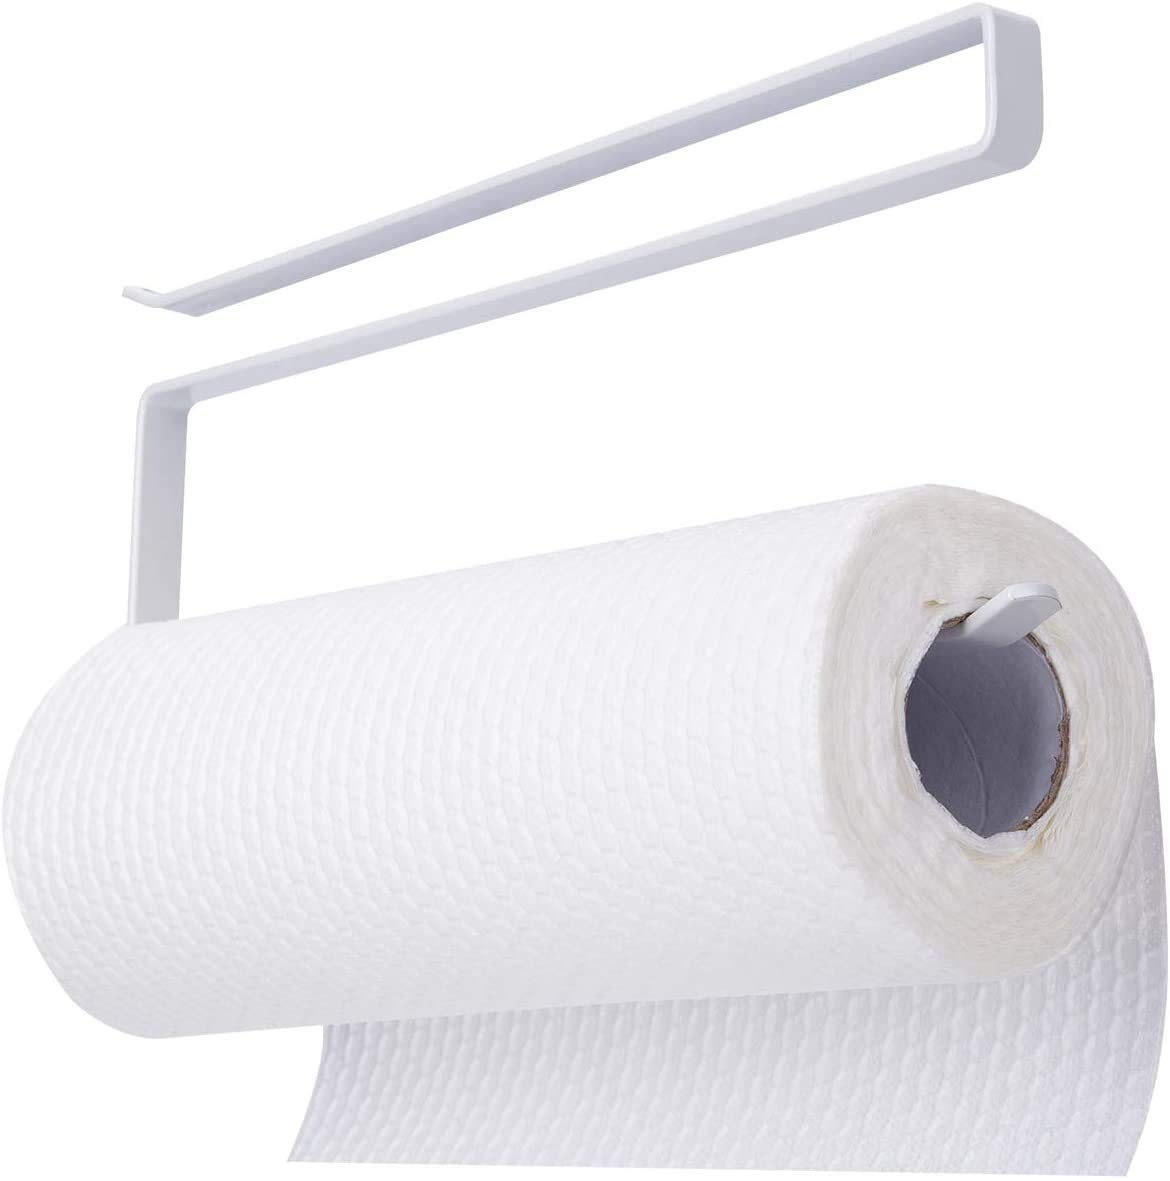 Bengvo Paper Holder Towel Holder Underneath Cabinet Rack Holder Over The Door Kitchen Roll Holder Toilet Paper Roll Holder Over The Cabinet (1)